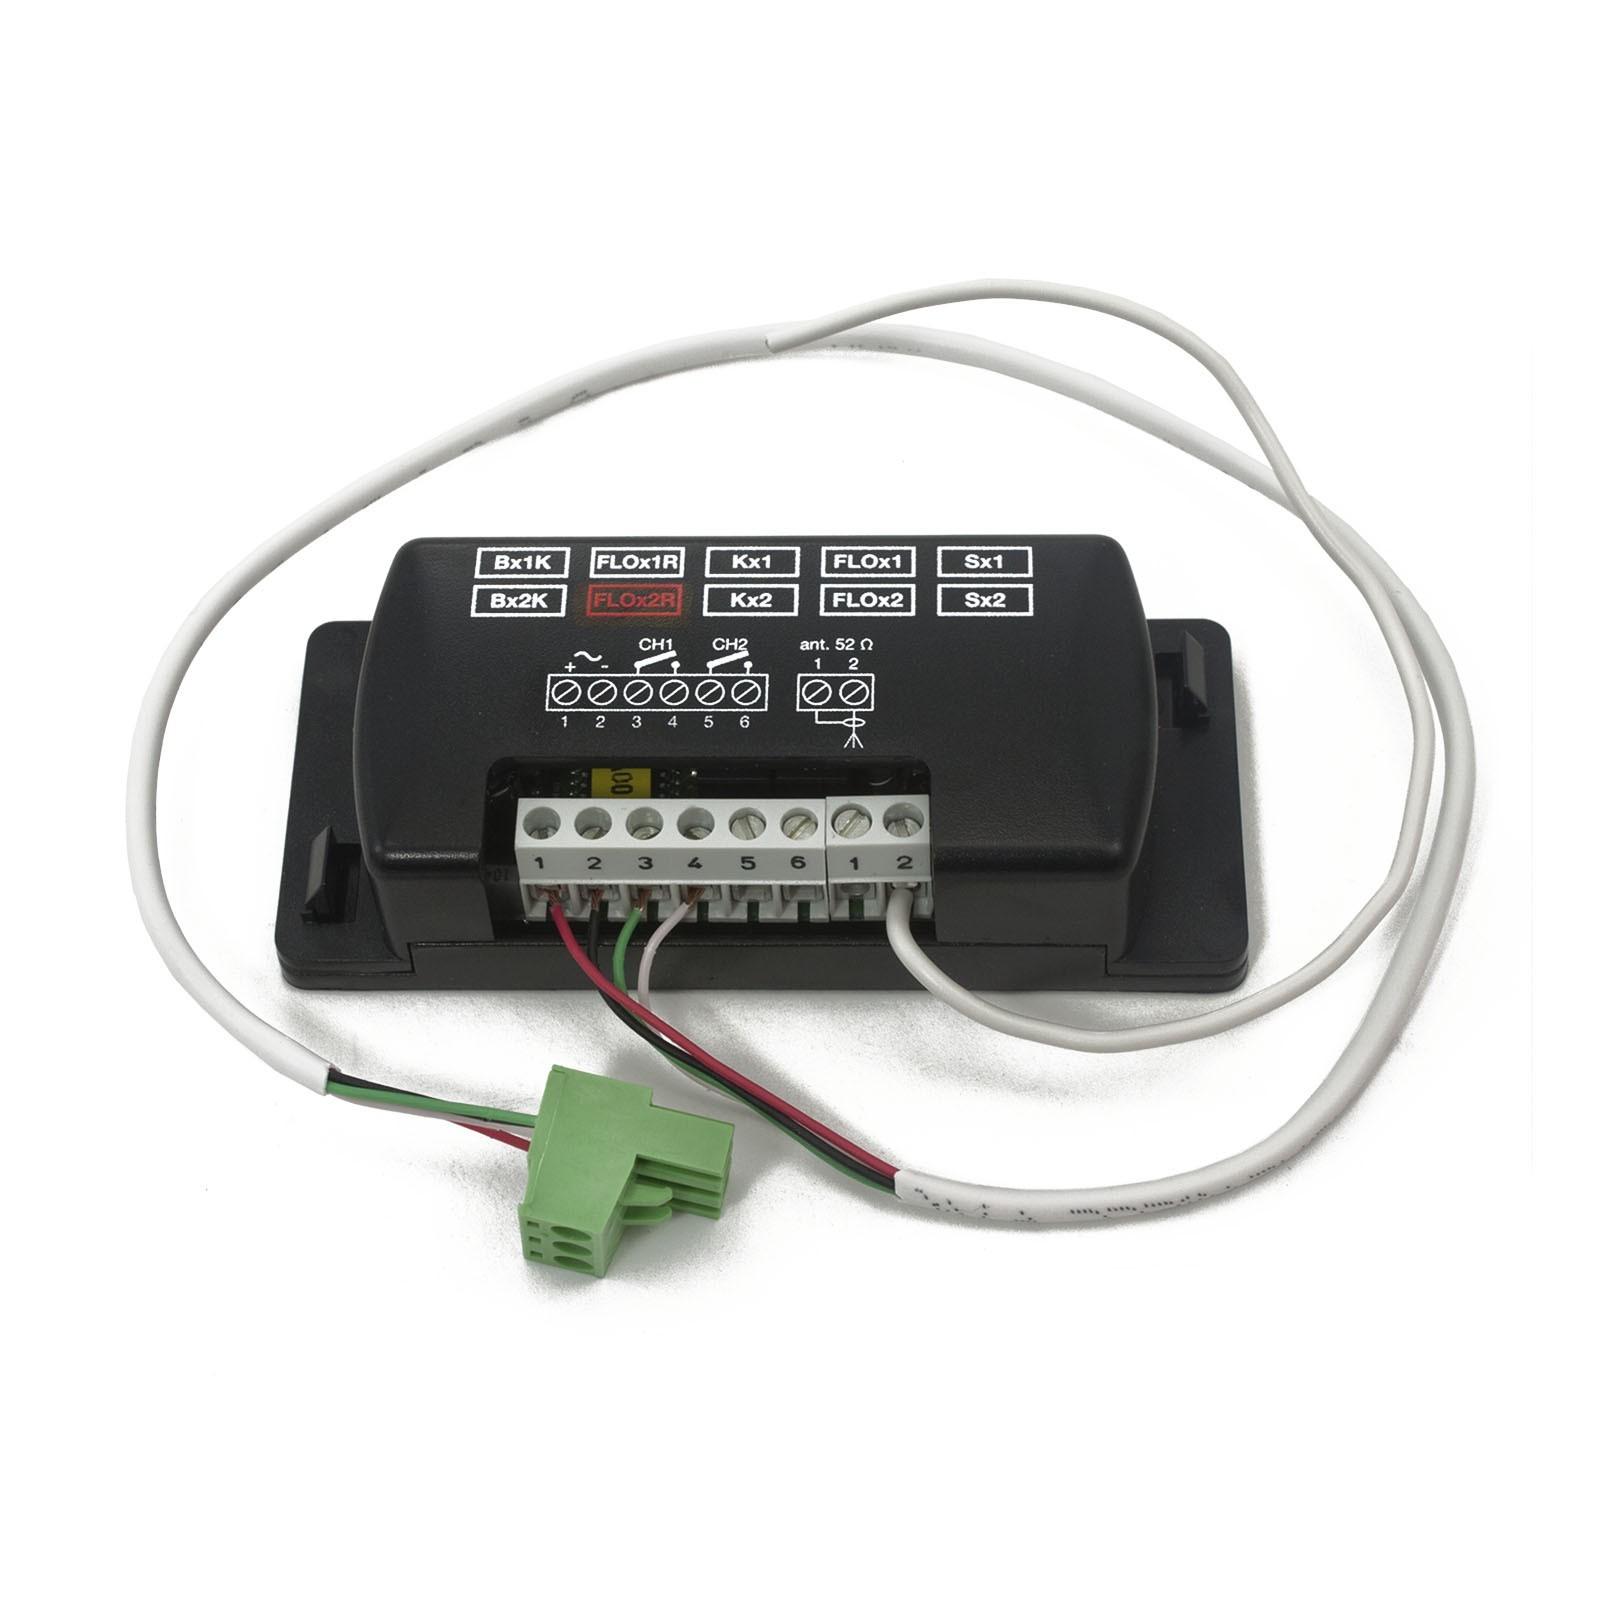 nice apollo 318n universal digital receiver mhz. Black Bedroom Furniture Sets. Home Design Ideas